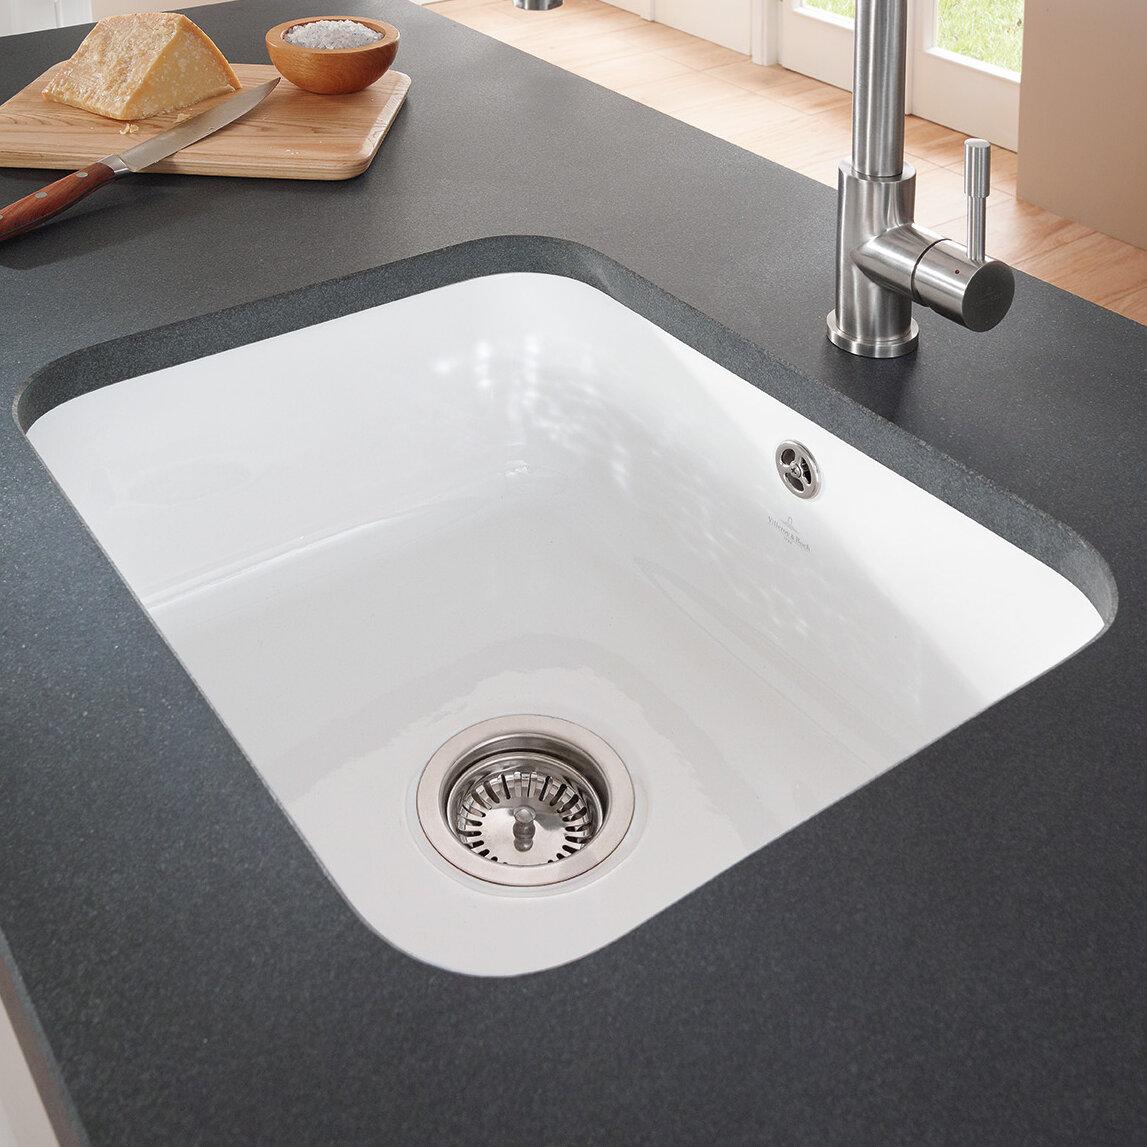 Villeroy boch cisterna 55cm x 44cm undermount kitchen sink wayfair co uk